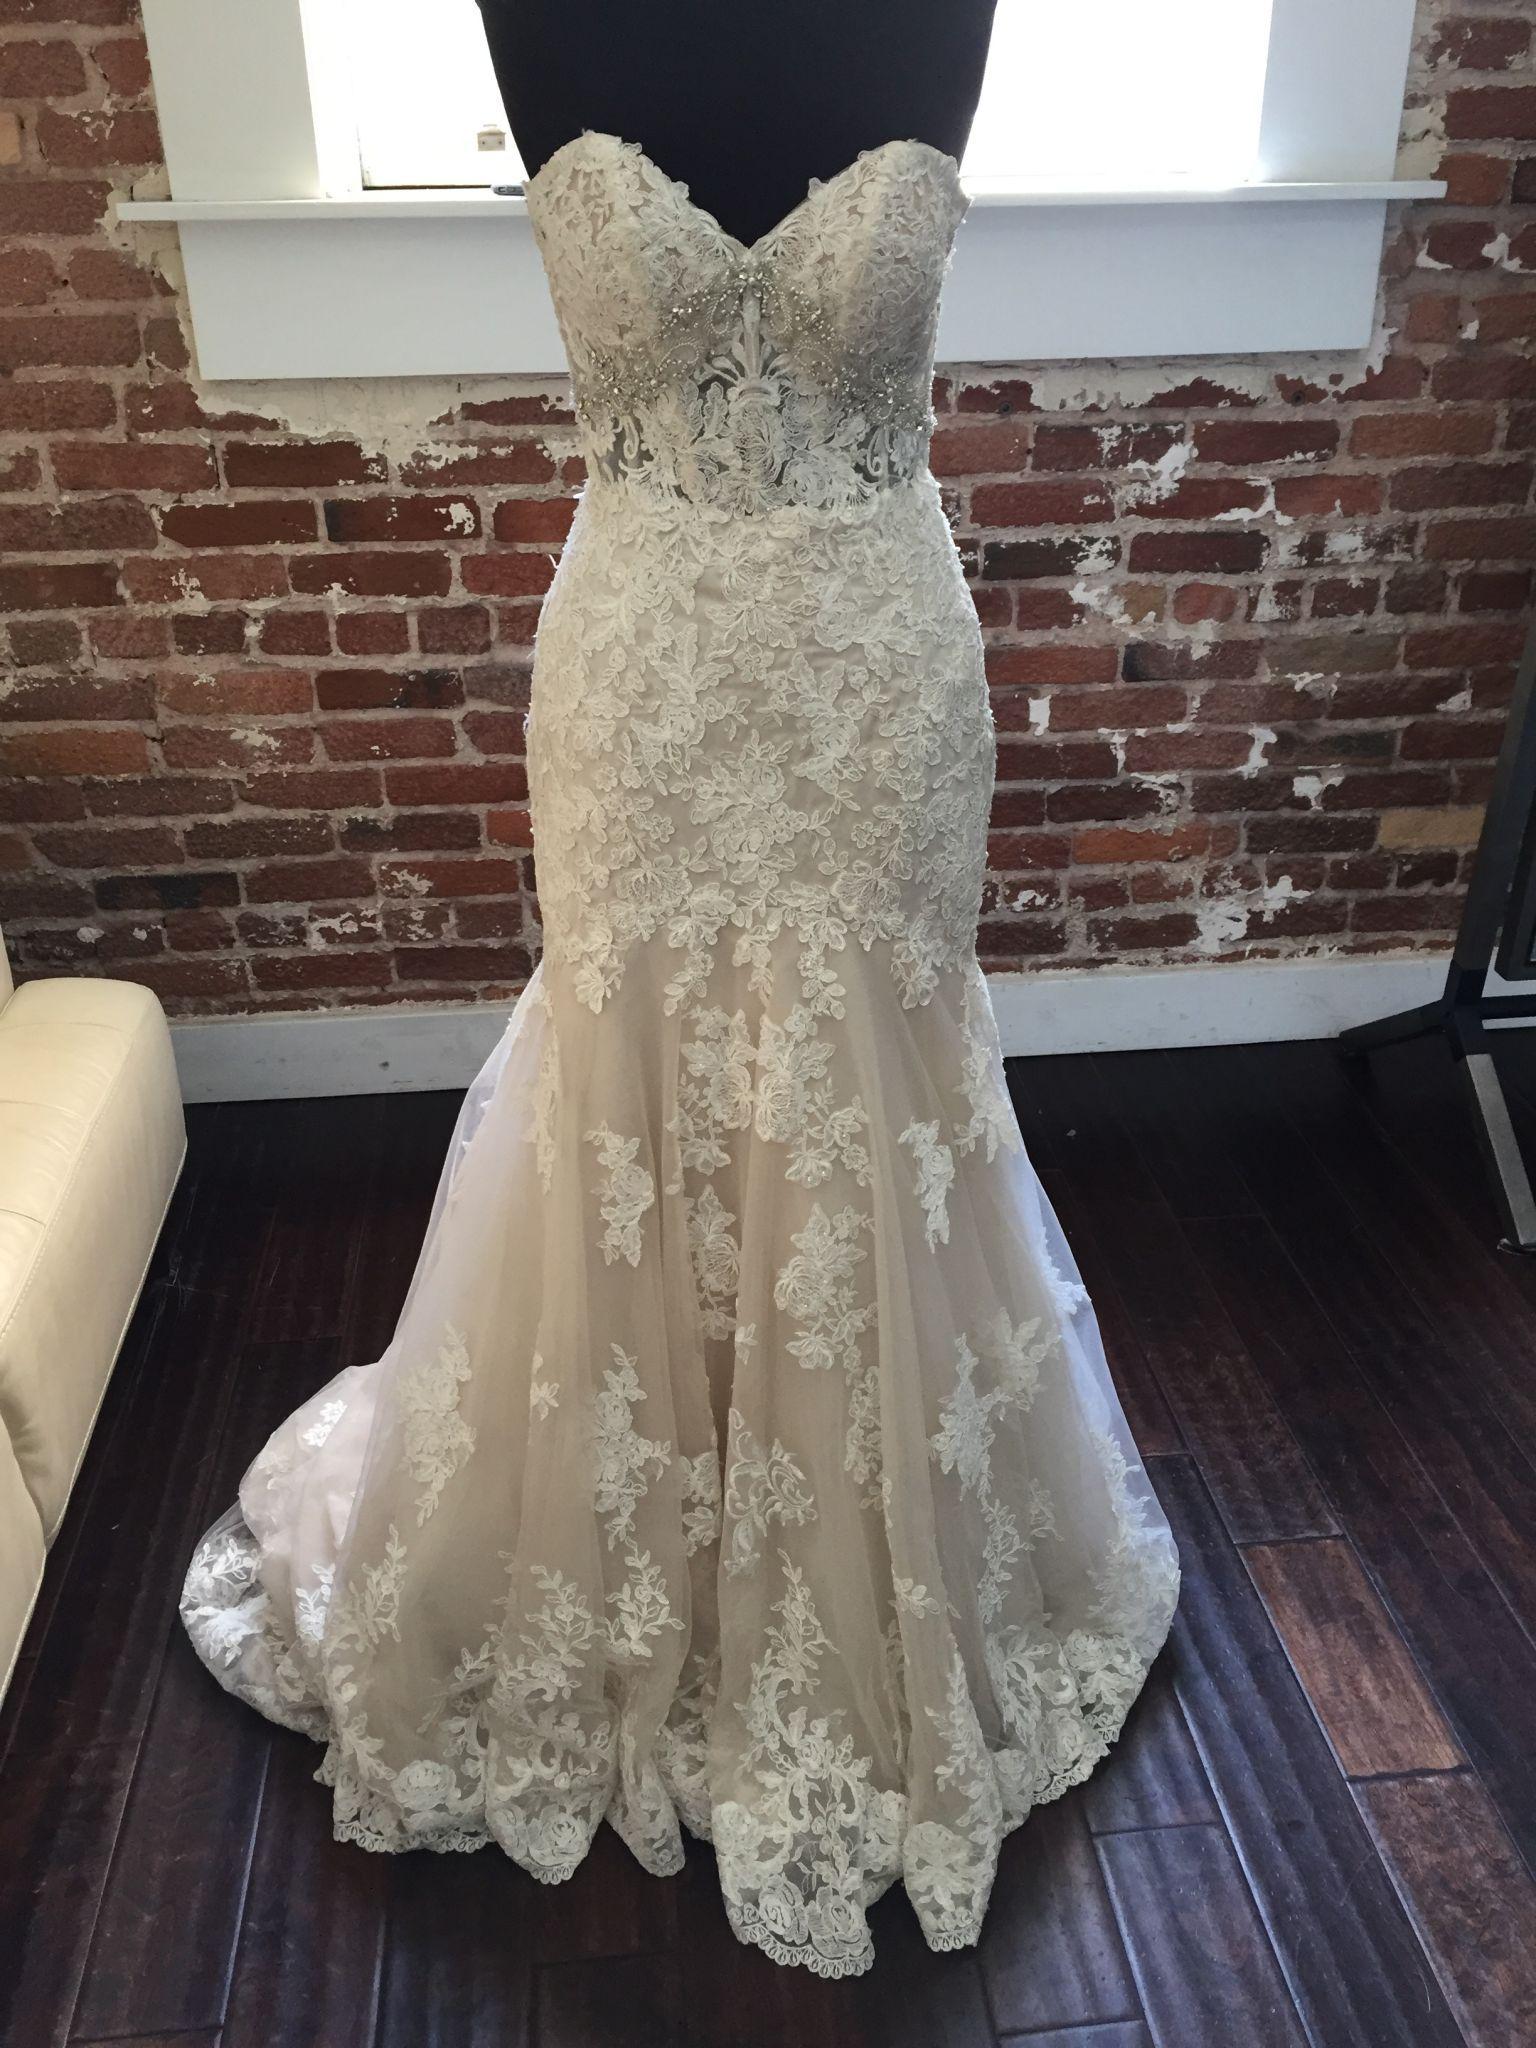 Essense Of Australia Du2042 600 Size 10 Sample Wedding Dresses Online Wedding Dress Online Wedding Dress Shopping Cheap Wedding Dress